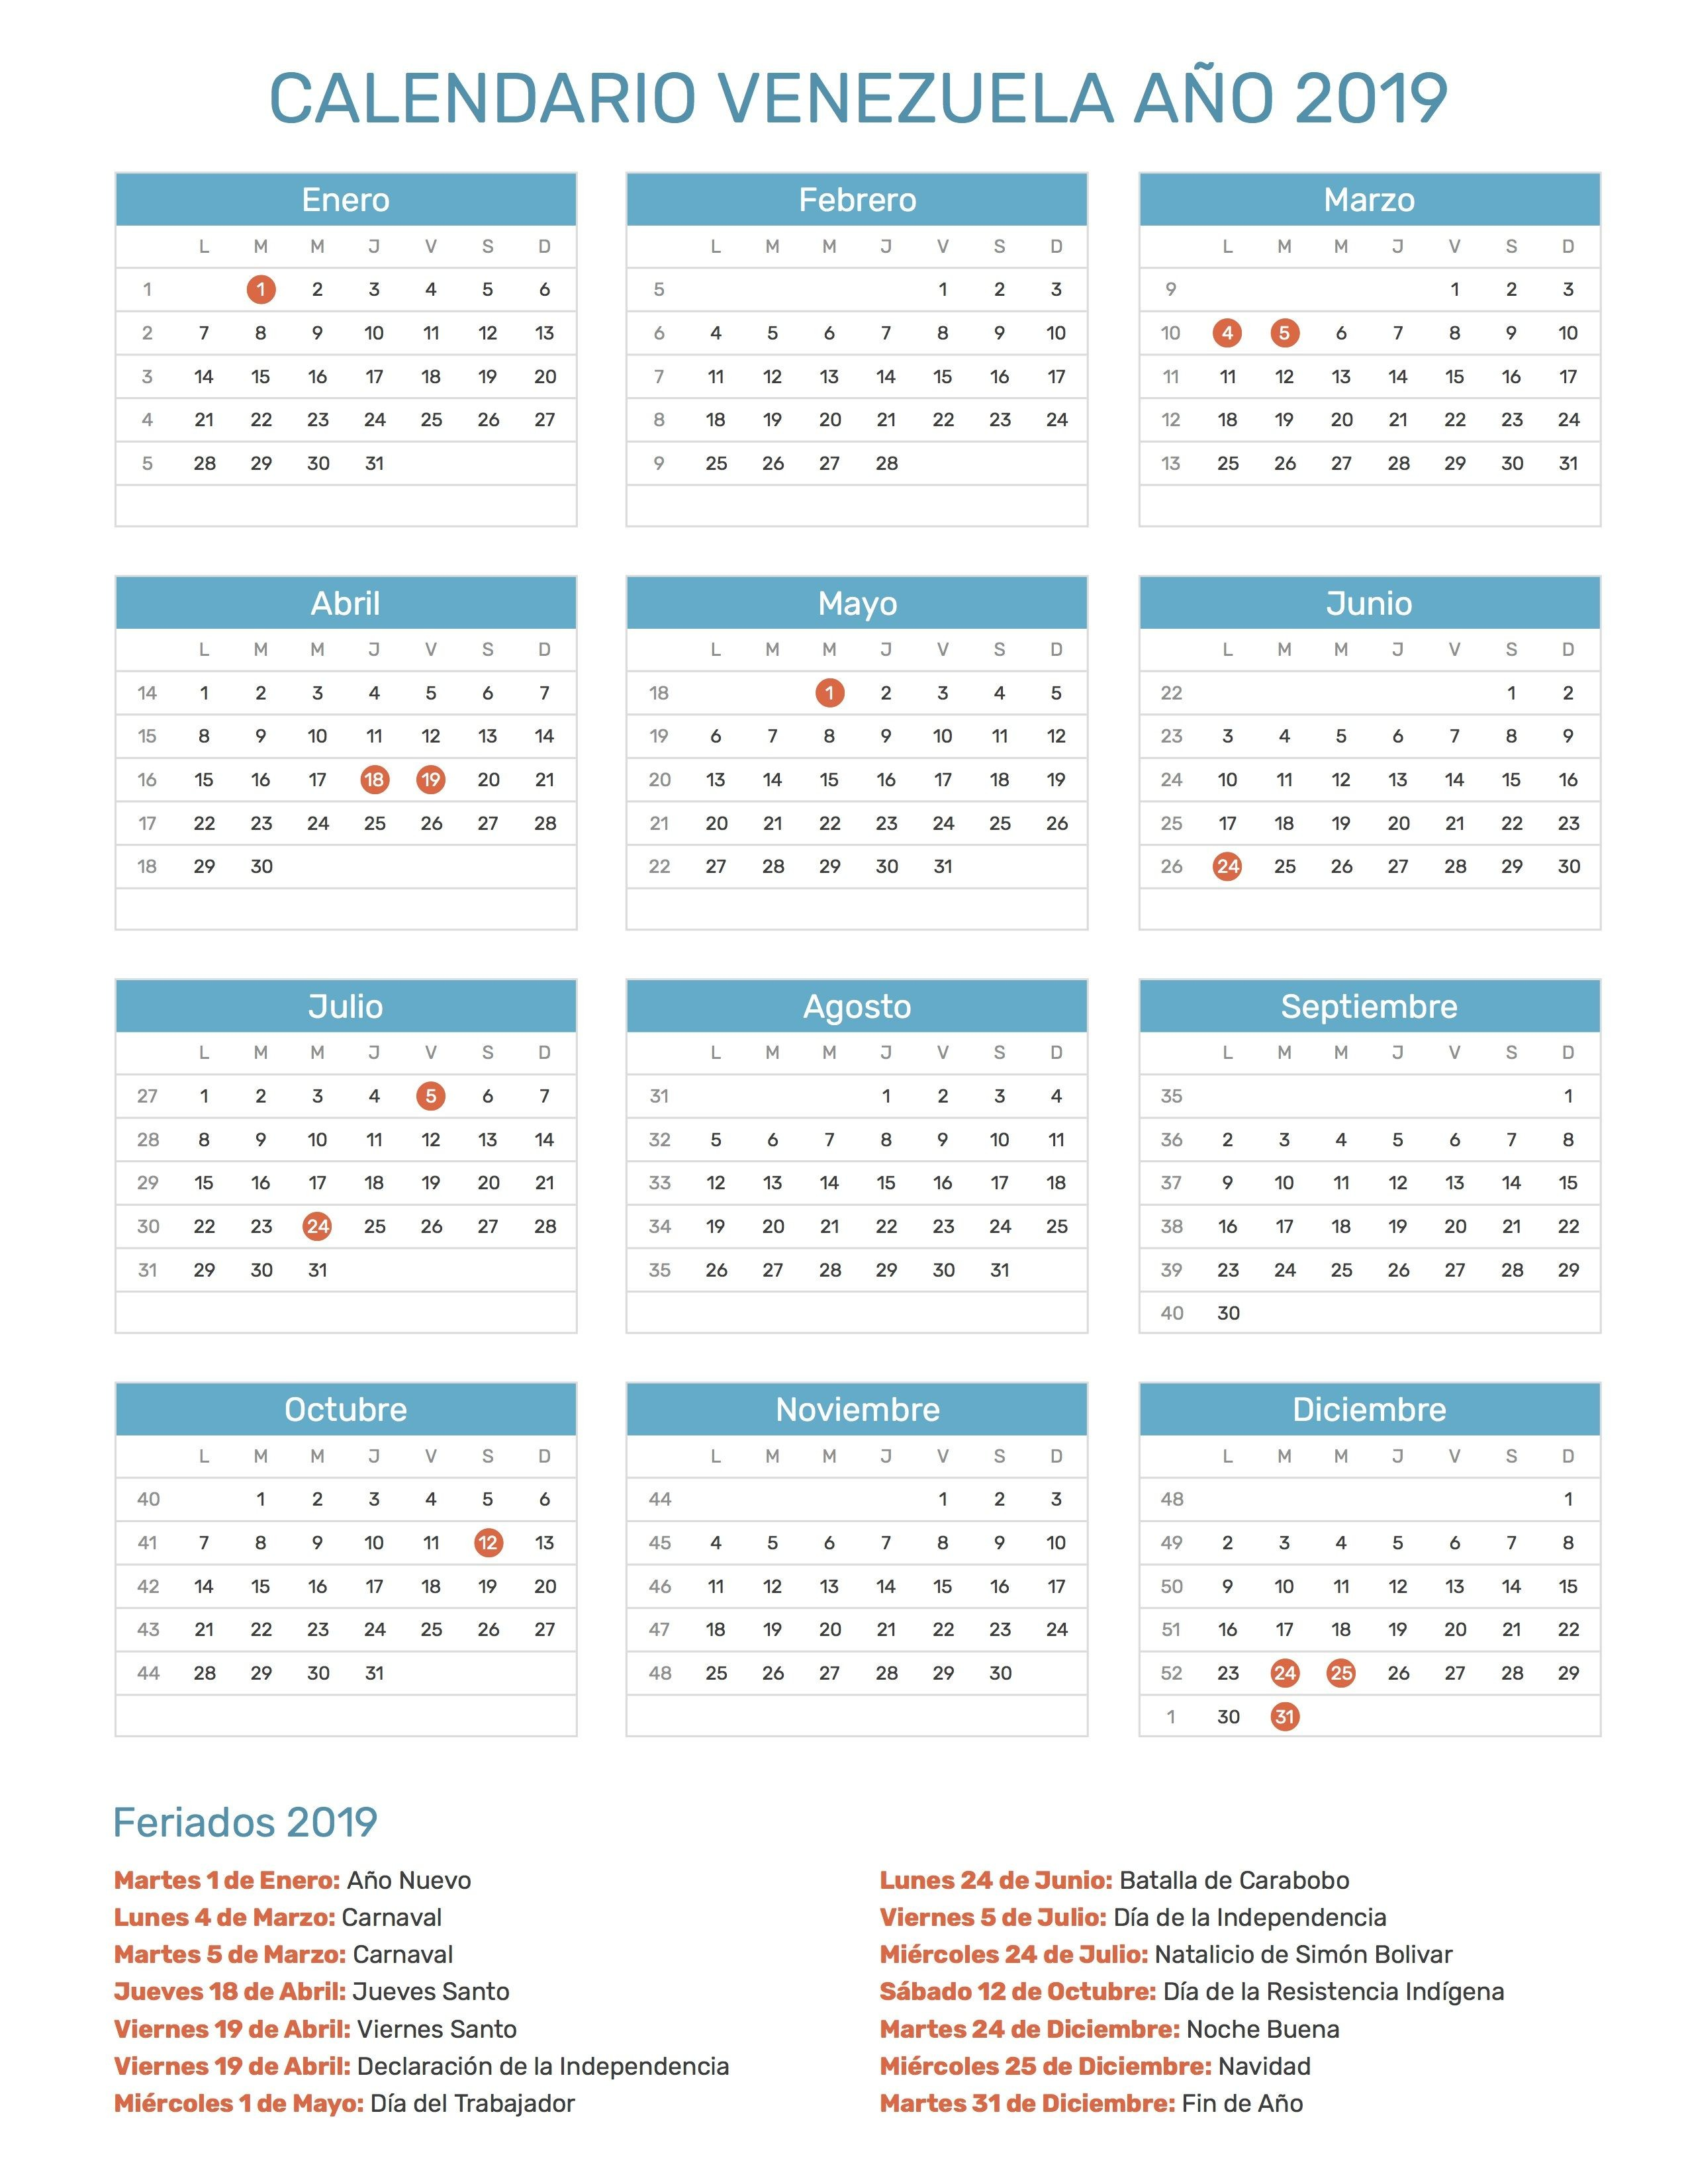 Calendario Abril 2019 Para Imprimir Minimalista Más Arriba-a-fecha Pin De Calendario Hispano En Calendario Con Feriados A±o 2019 Of Calendario Abril 2019 Para Imprimir Minimalista Mejores Y Más Novedosos Imprimir Calendario Latest Agosto Calendario Para Imprimir top